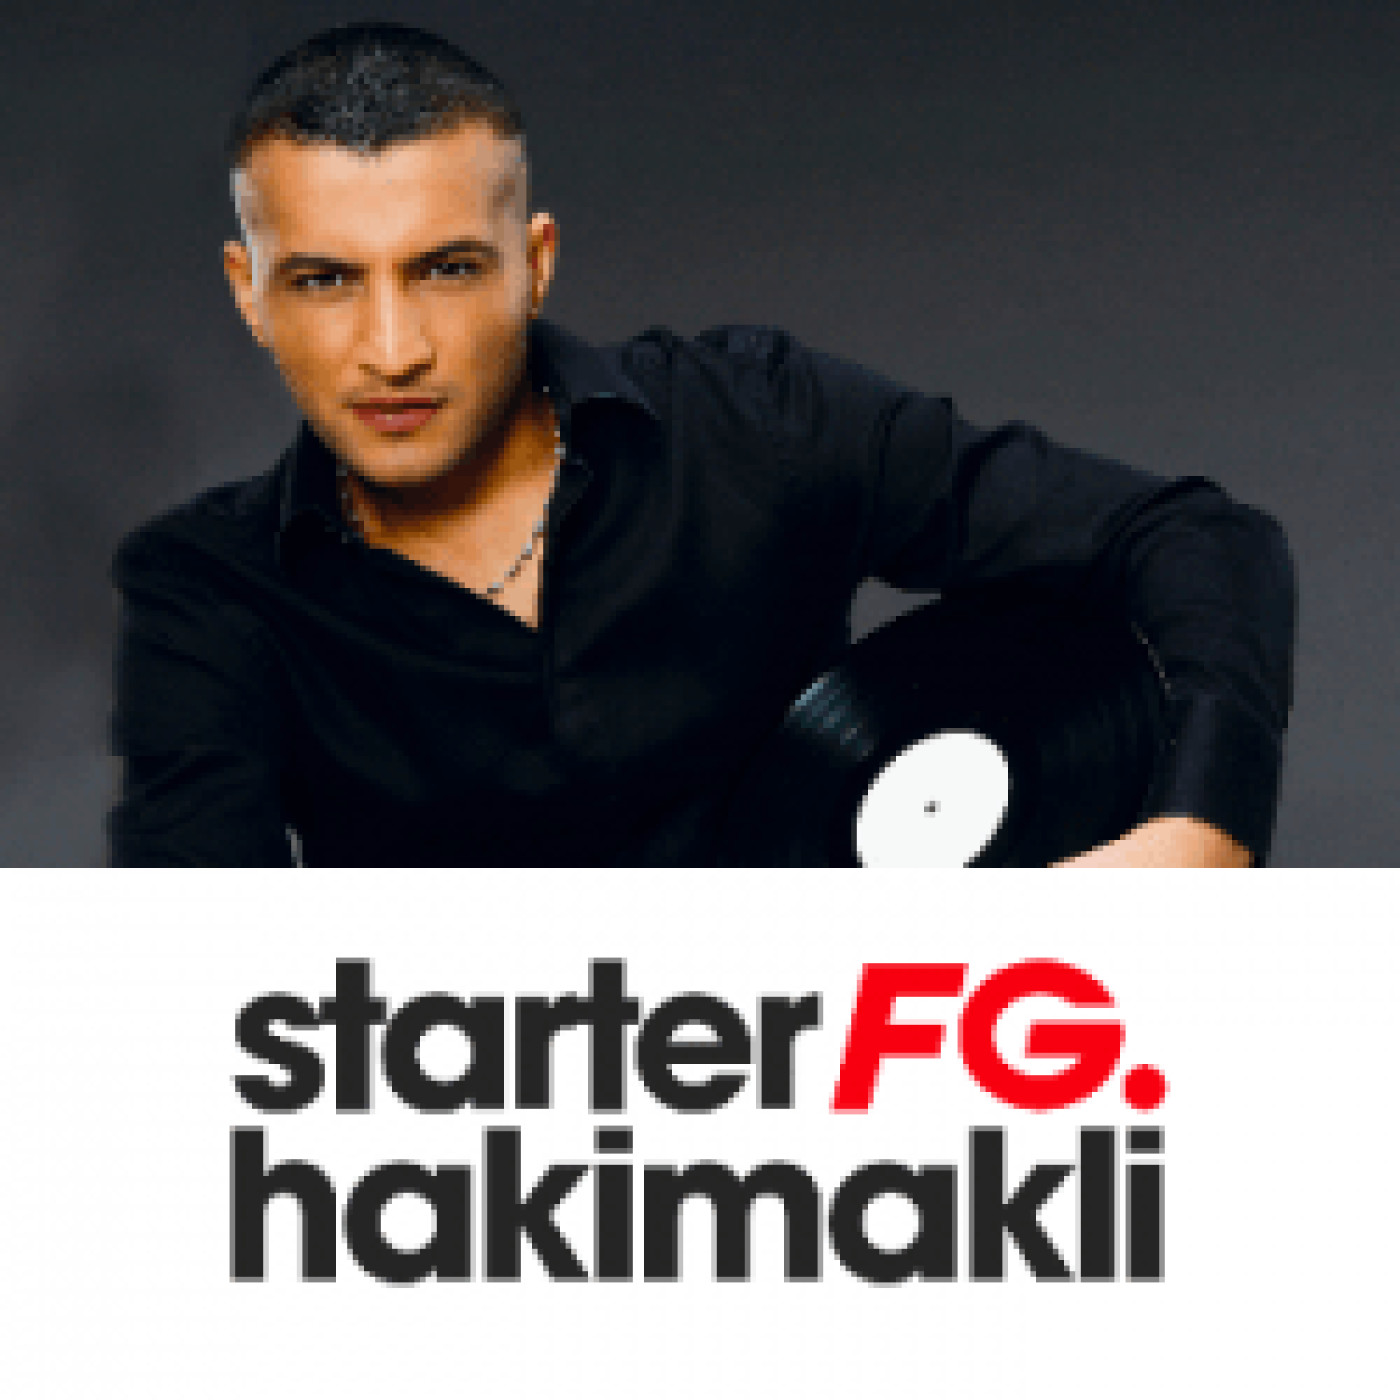 STARTER FG BY HAKIMAKLI MERCREDI 9 SEPTEMBRE 2020